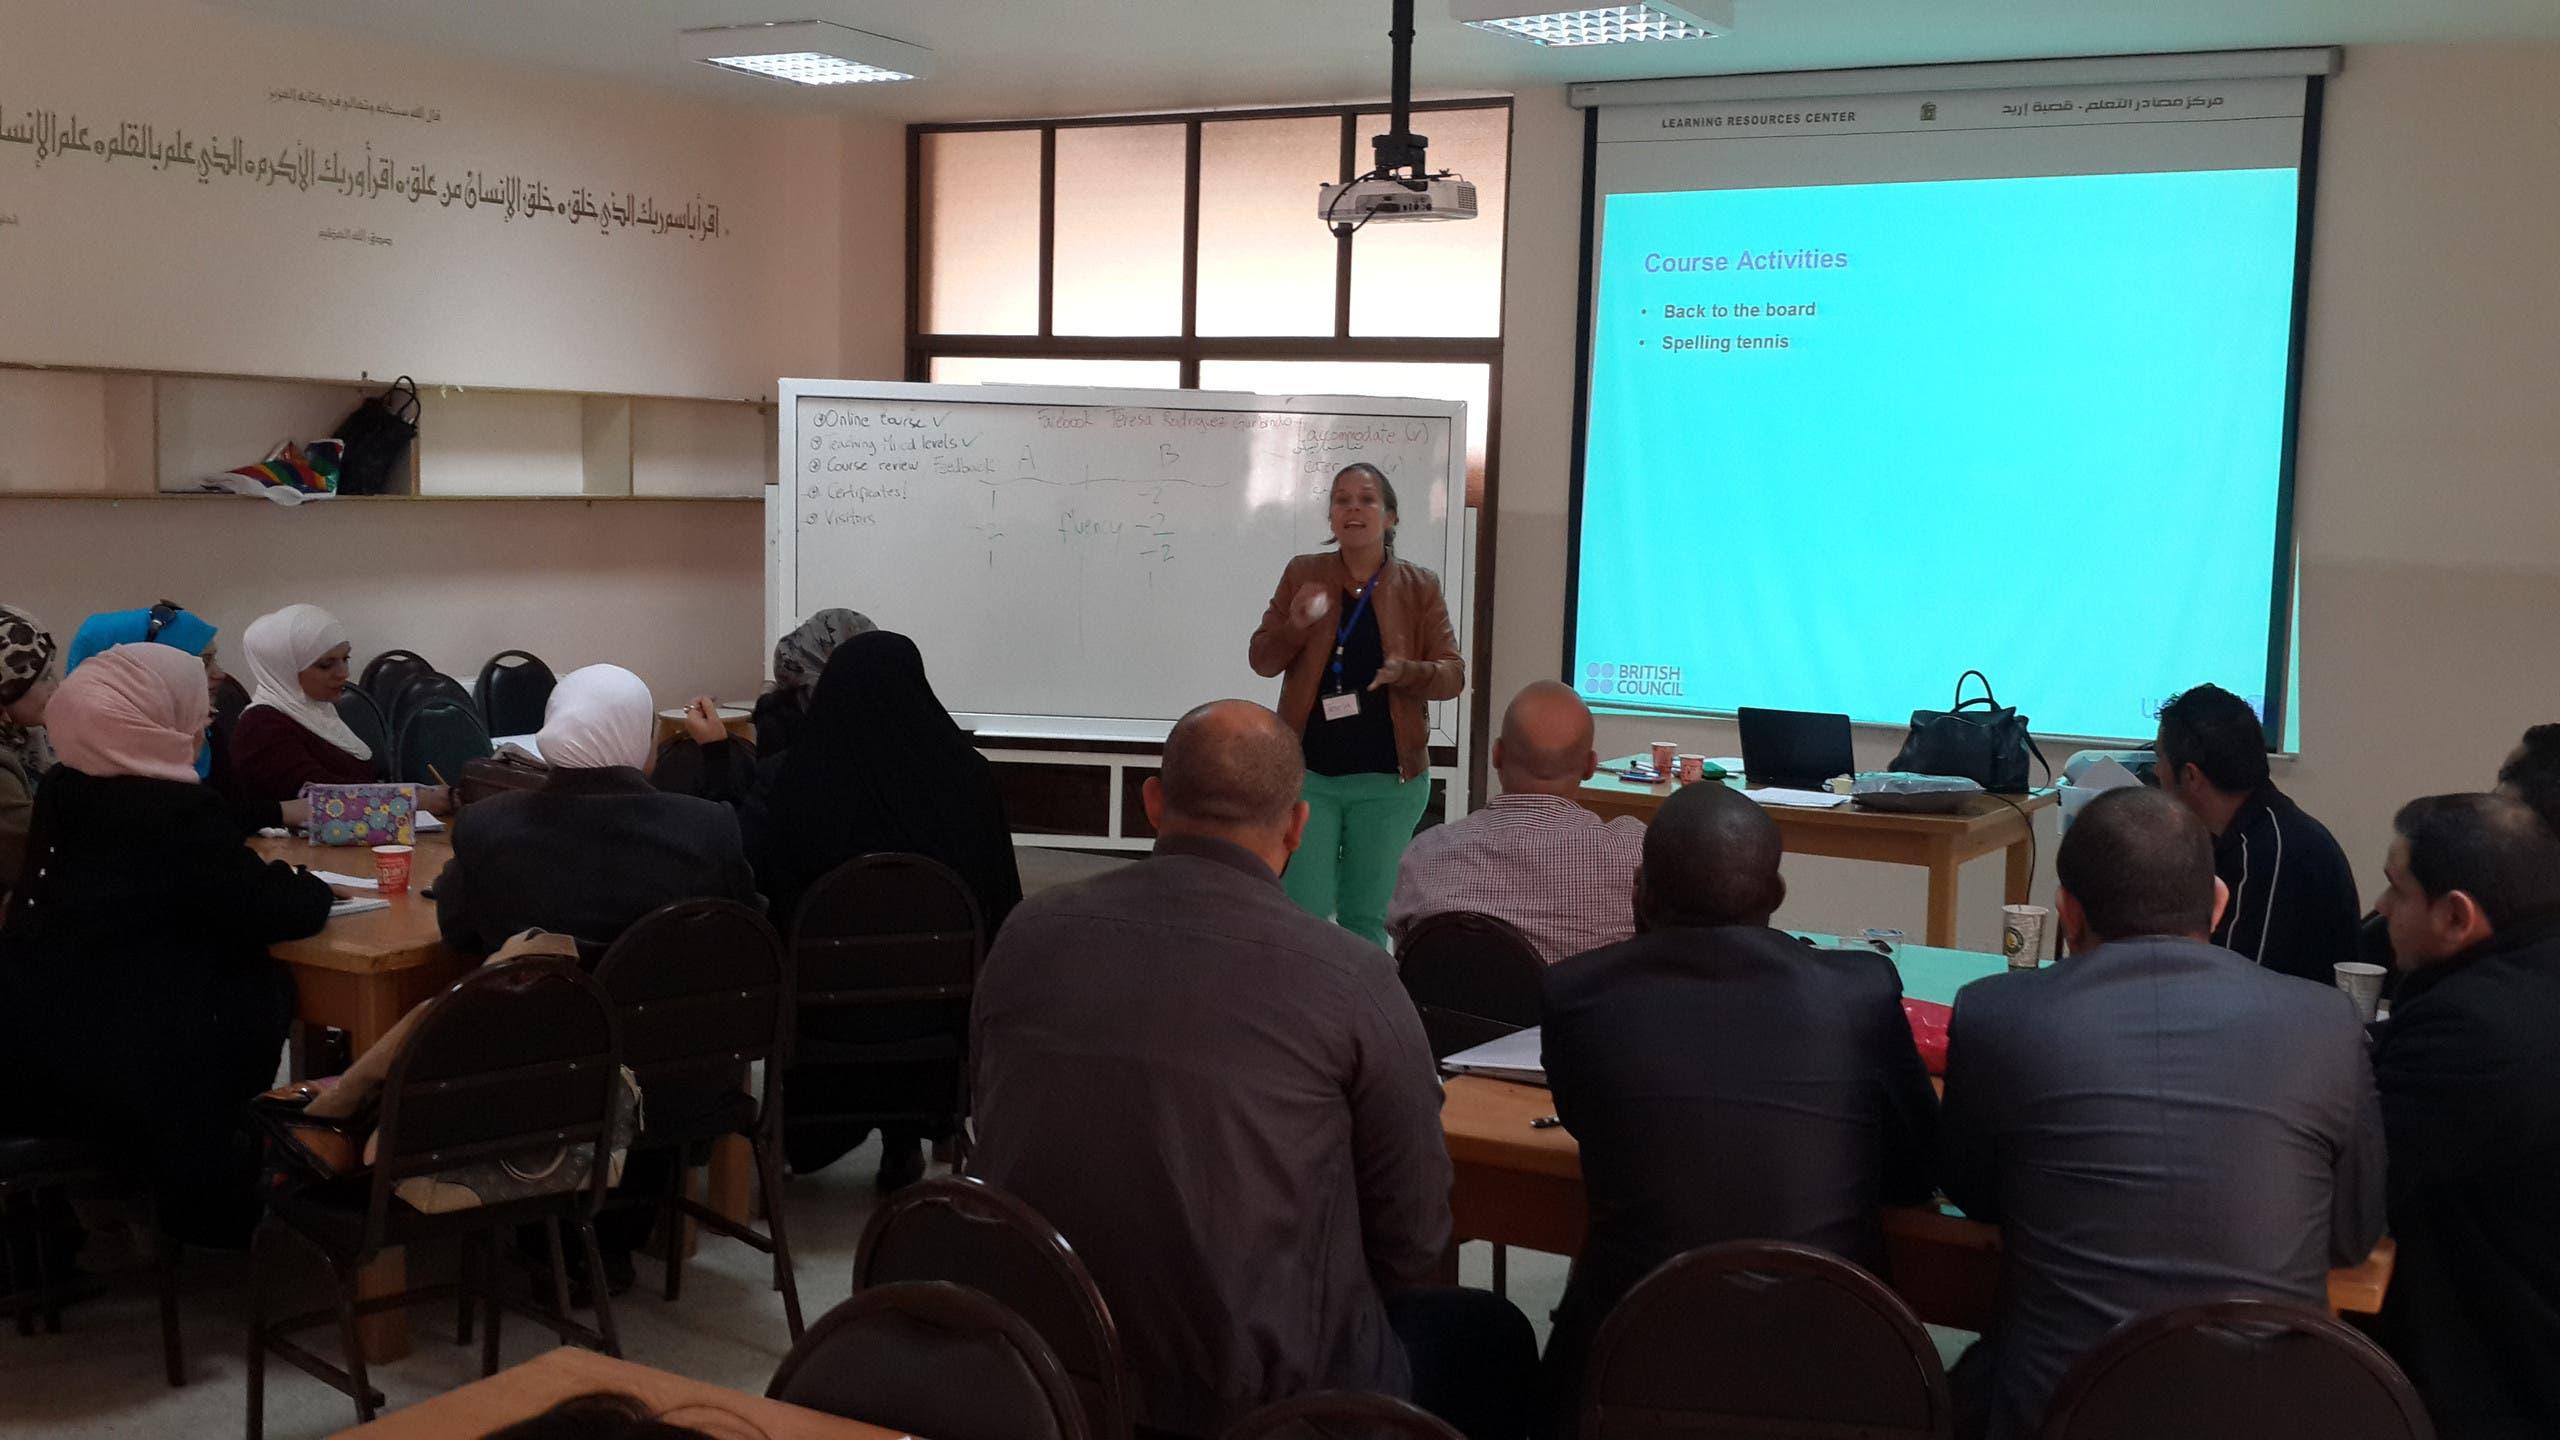 RODRIGUES TRAINS JORDANIAN TEACHERS IN AN EDUCATIONAL CTNER IN IRBID MARCH 22, 2016.